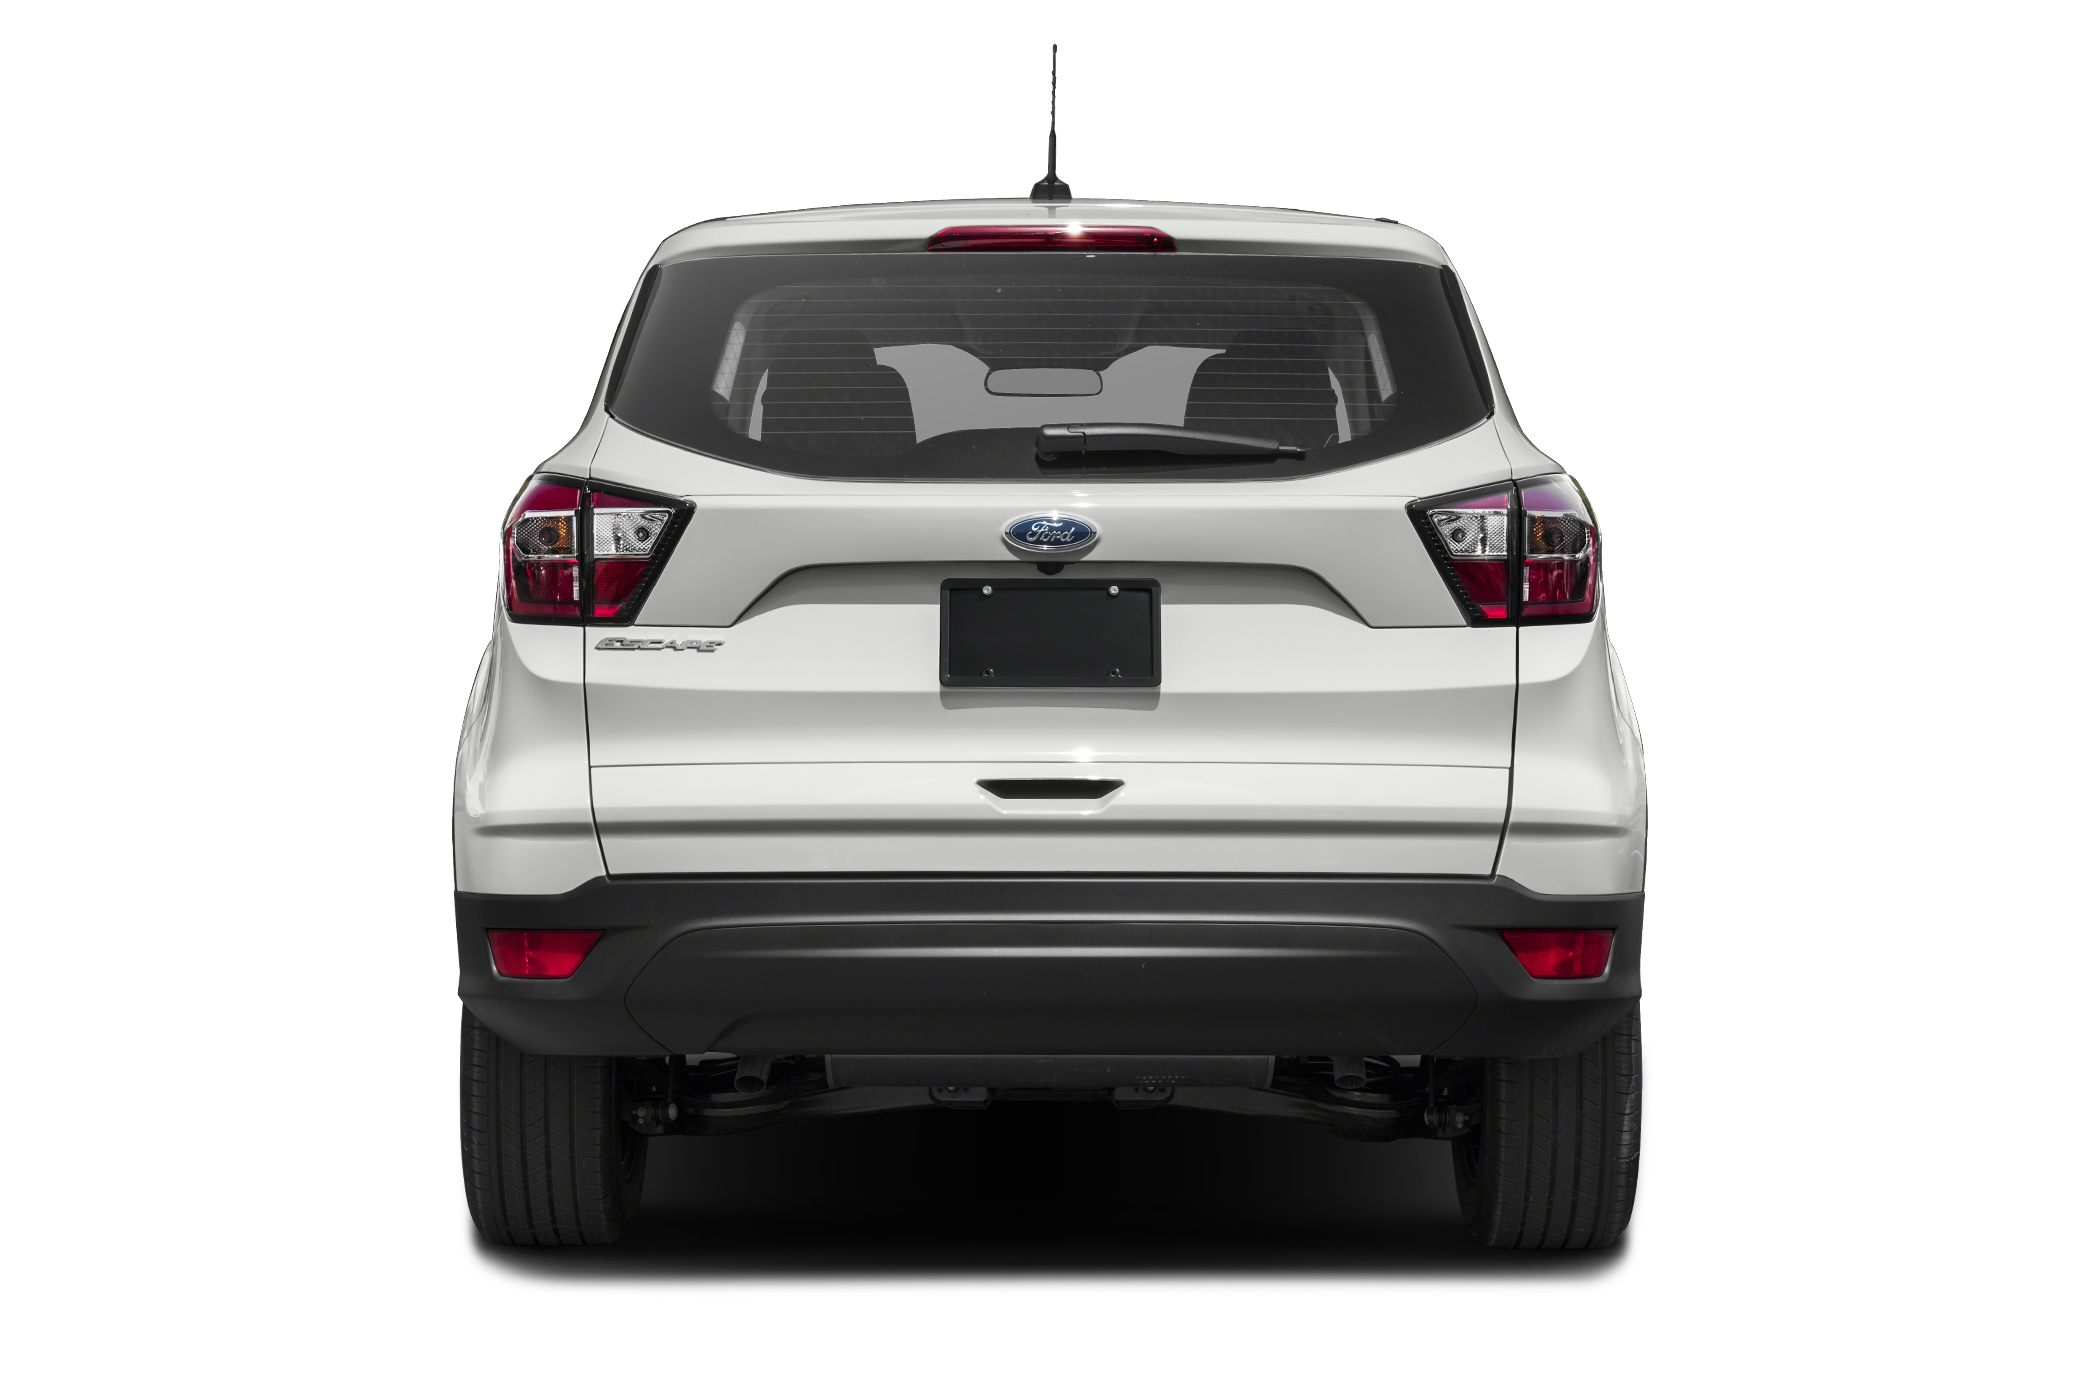 Used 2018 ford escape for sale in buckner near louisville ky vin 1fmcu0hdxjub12254